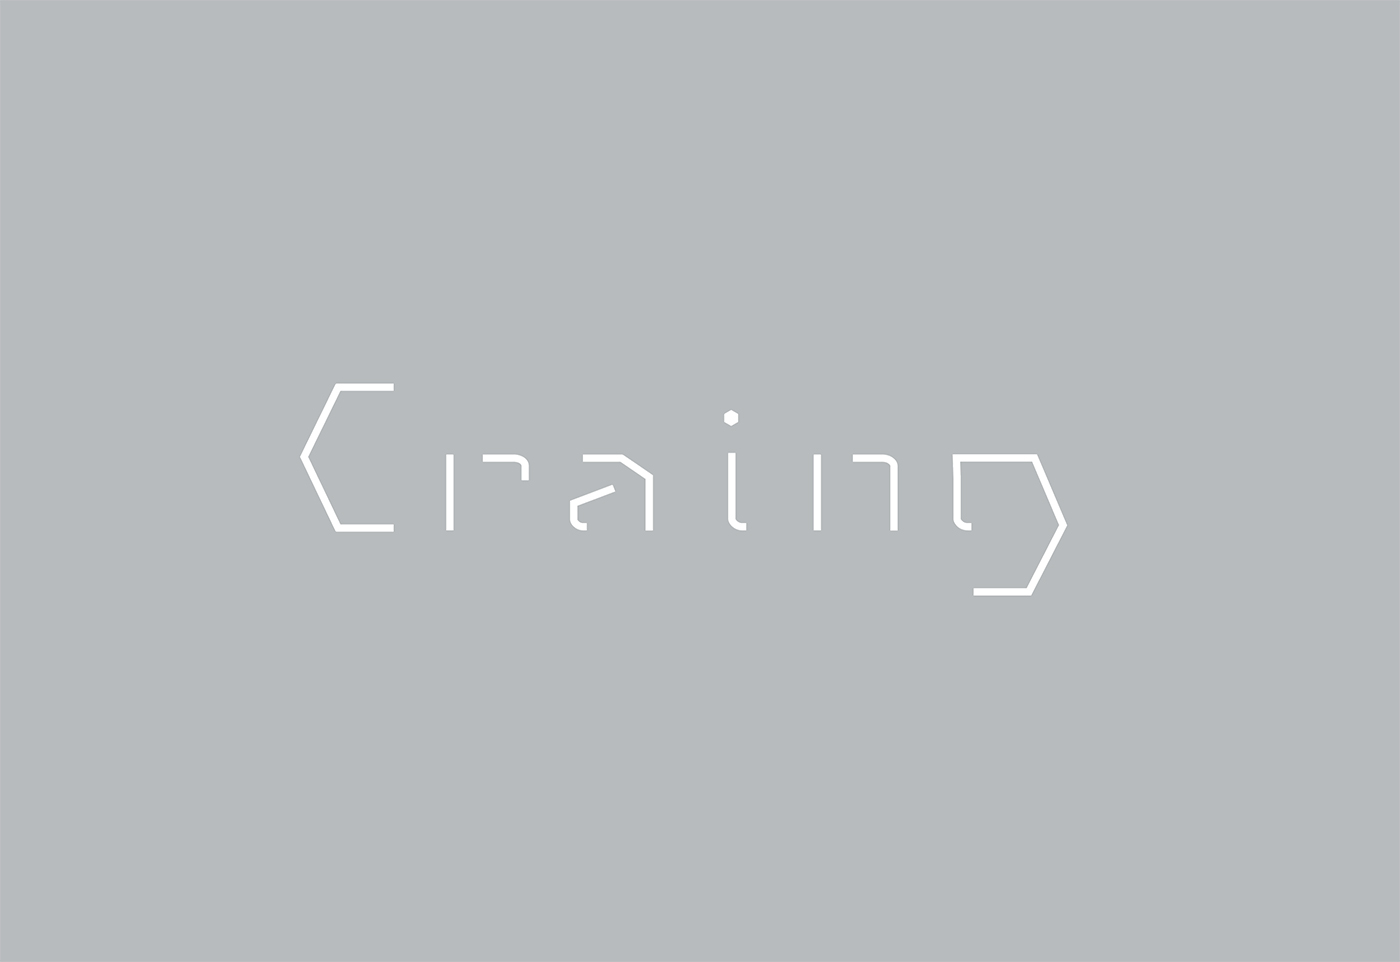 craing.jpg